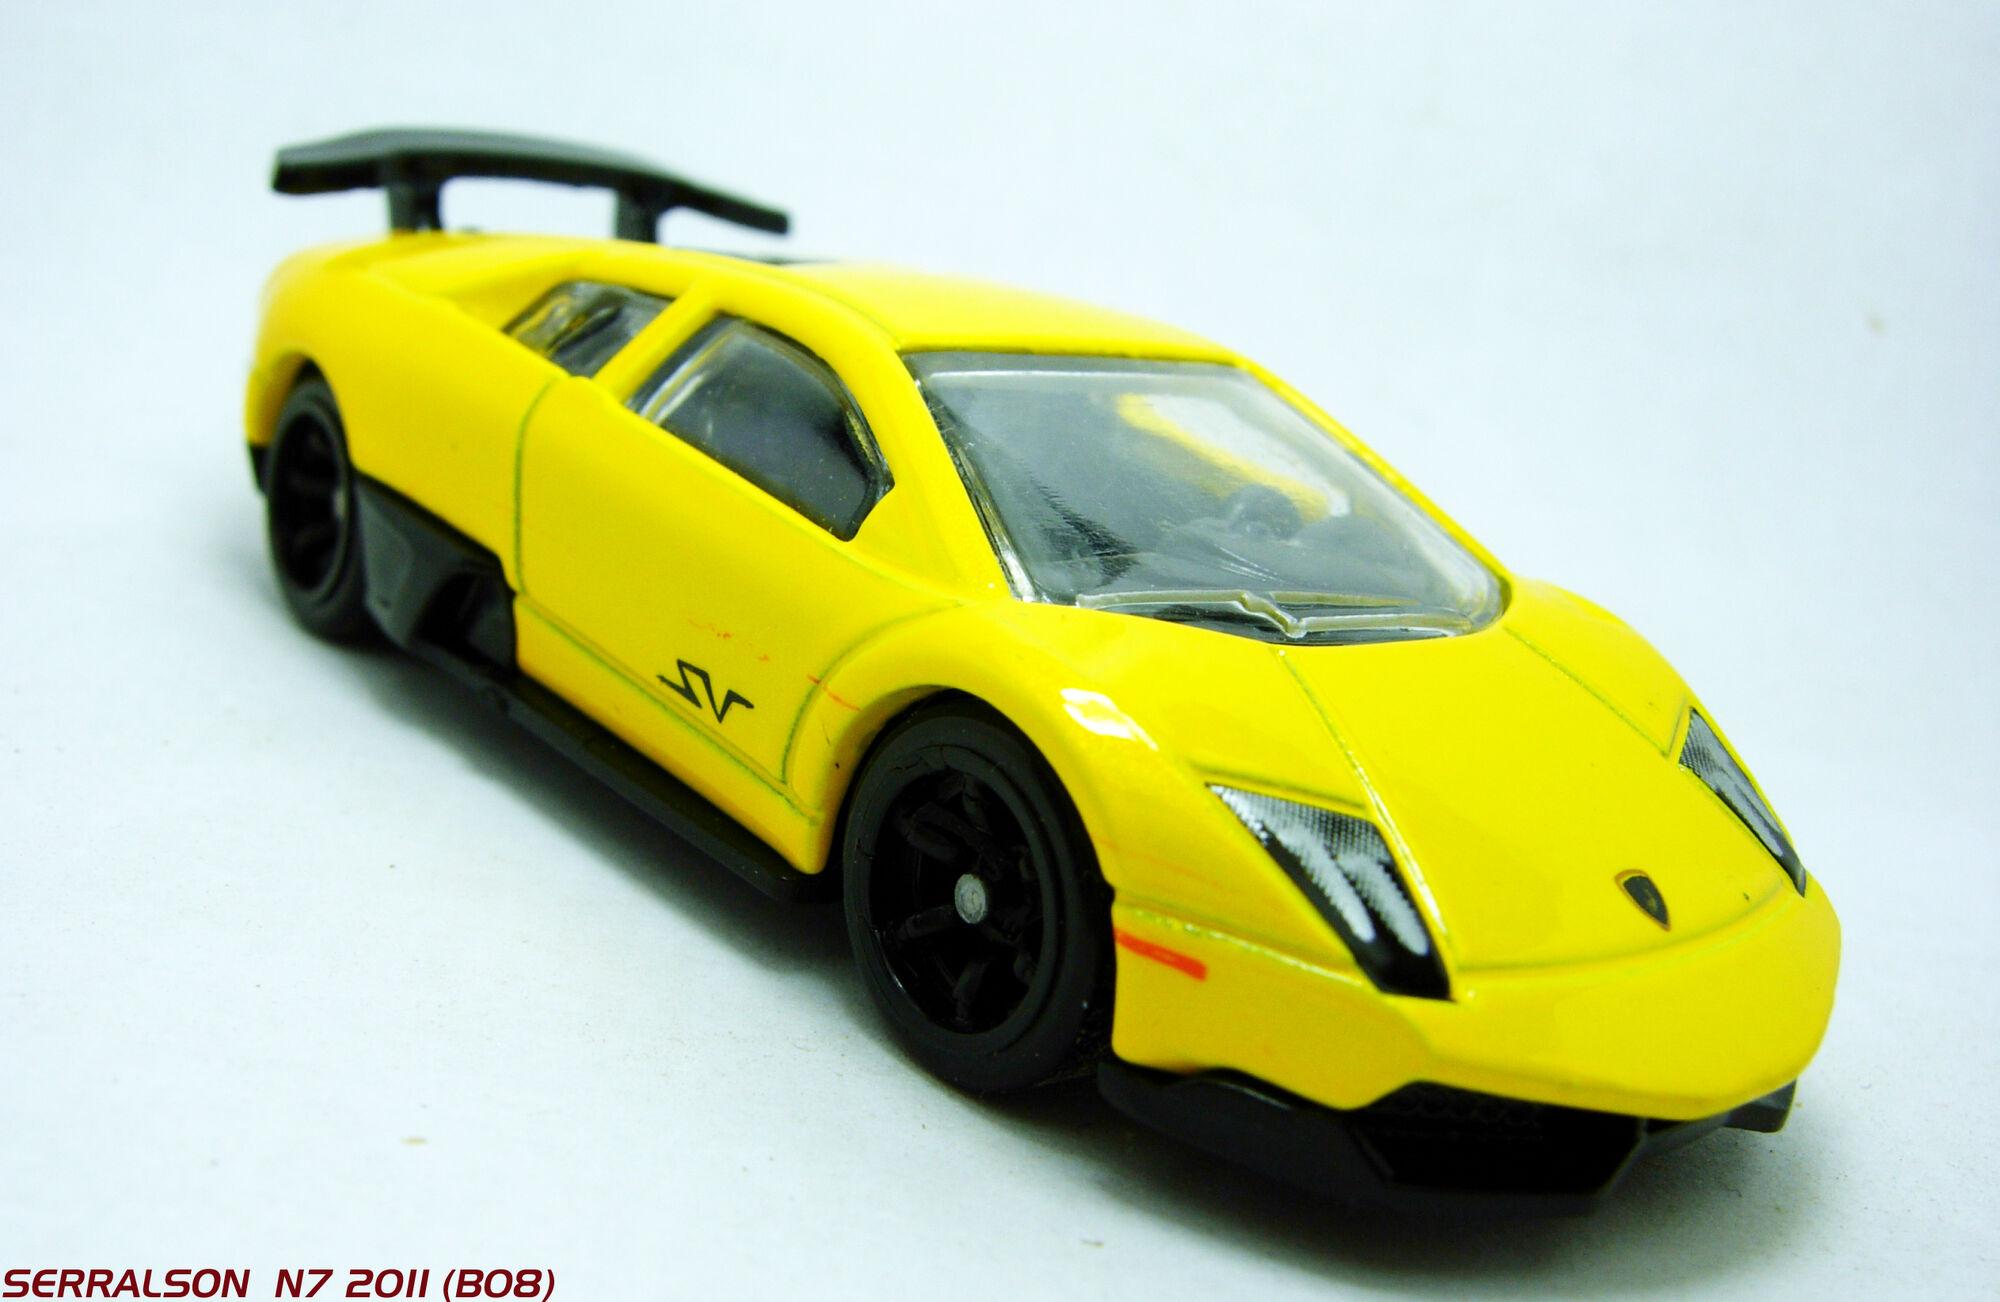 2000?cb=20110303123231 Surprising Lamborghini Gallardo Hot Wheels Wiki Cars Trend